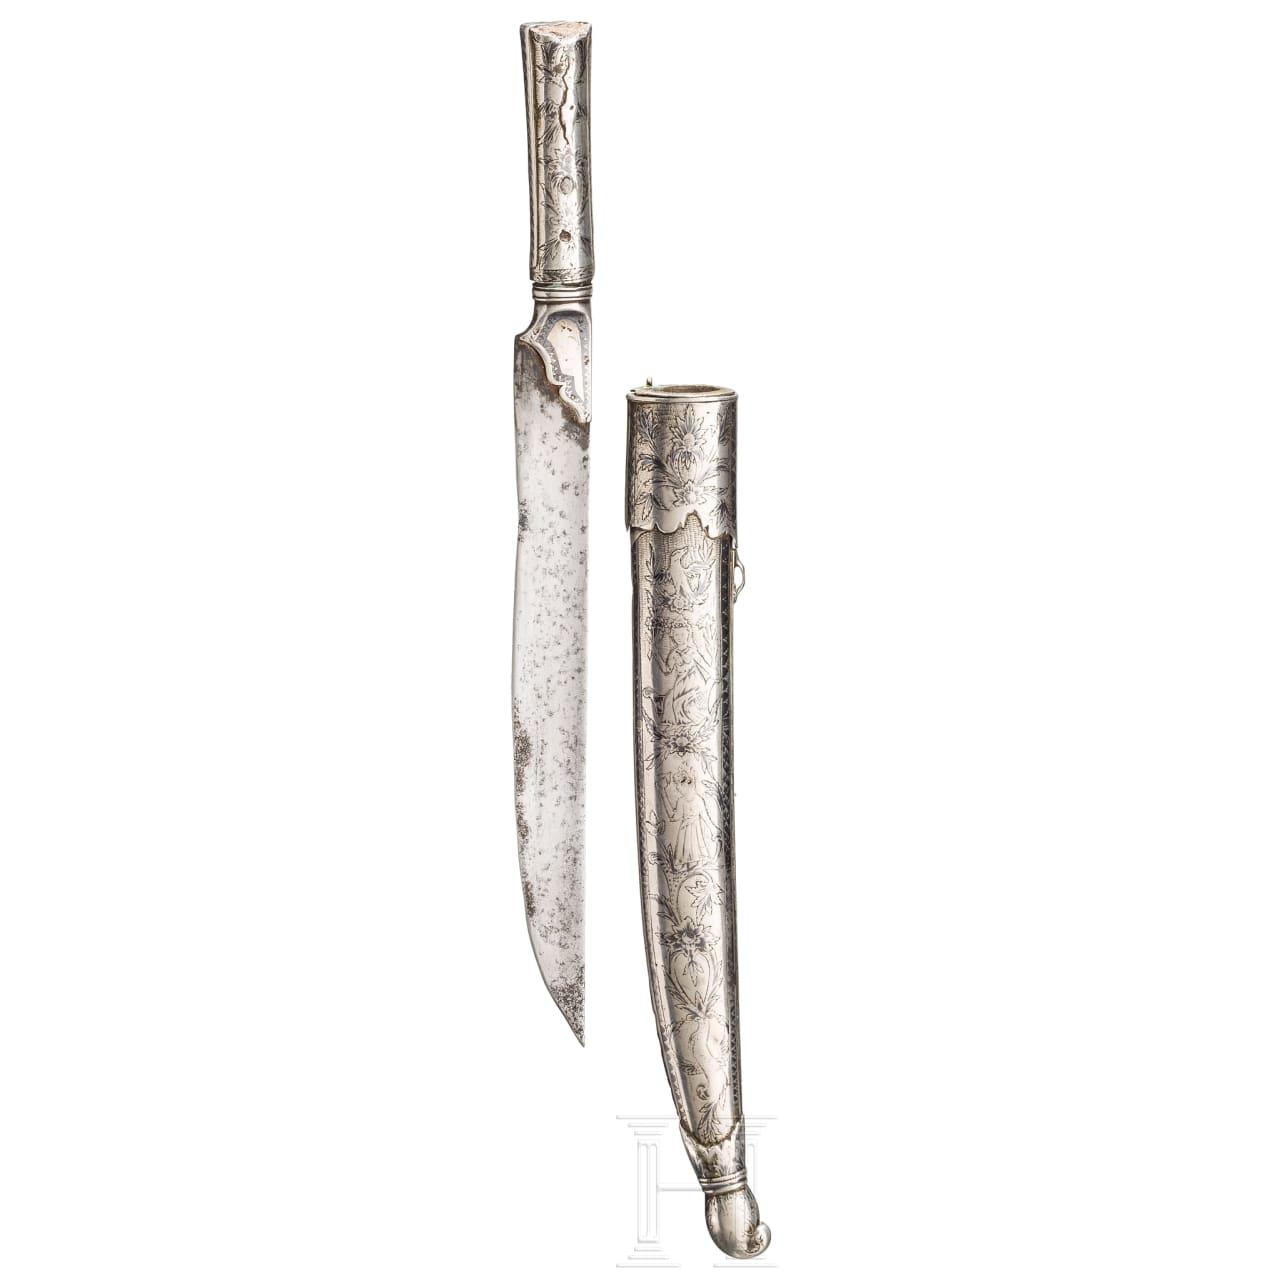 An Ottoman/Caucasian silver-mounted and nielloed dagger, 19th century